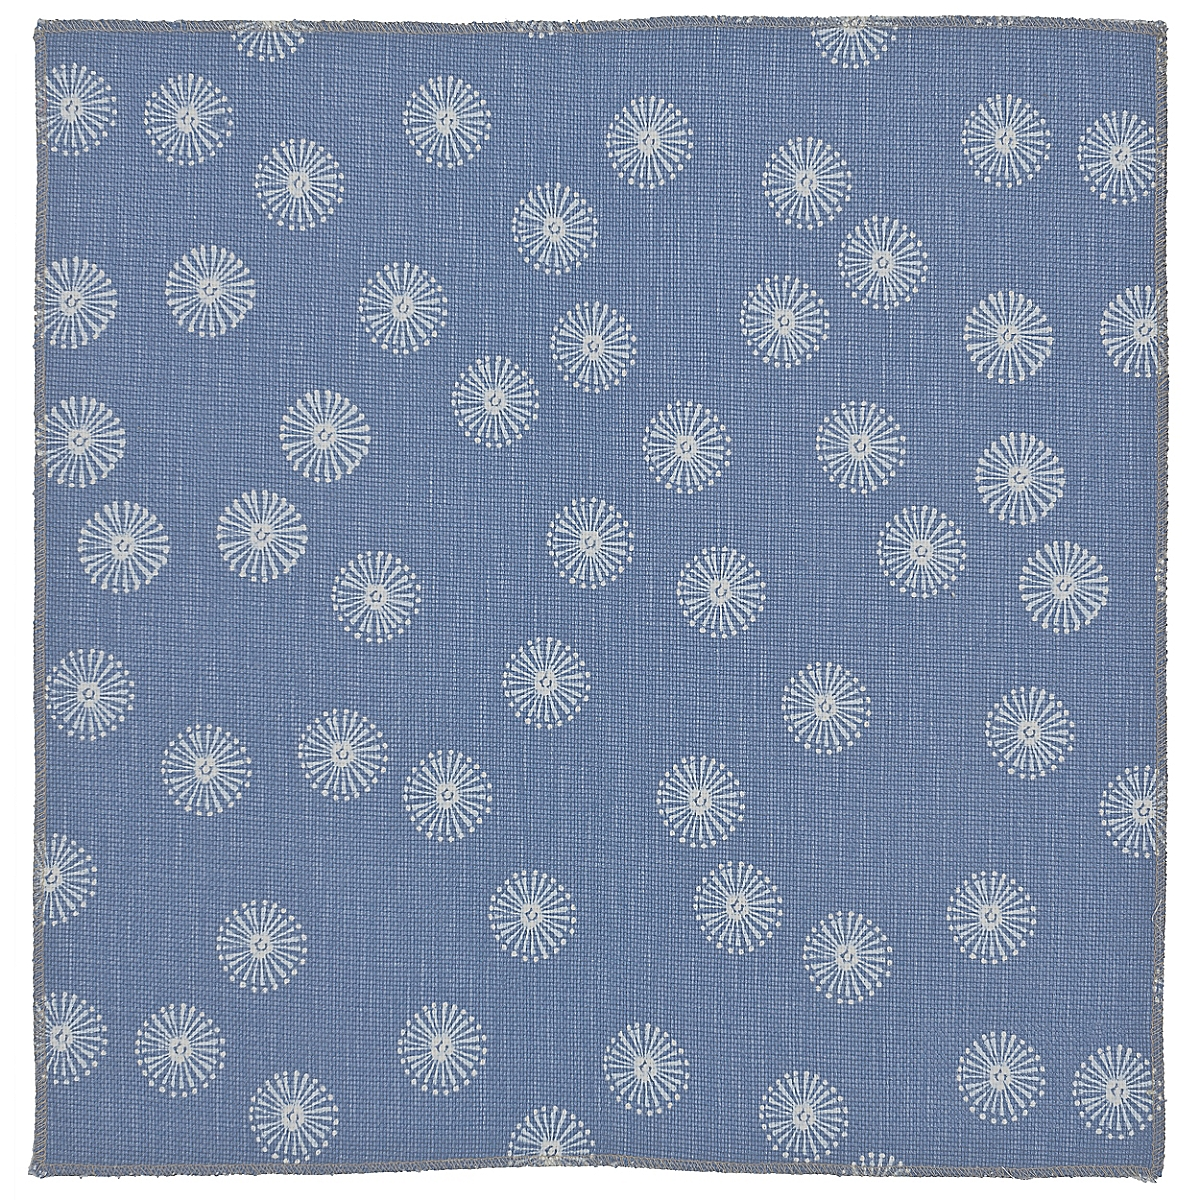 Dilly: French Blue (fabric yardage)